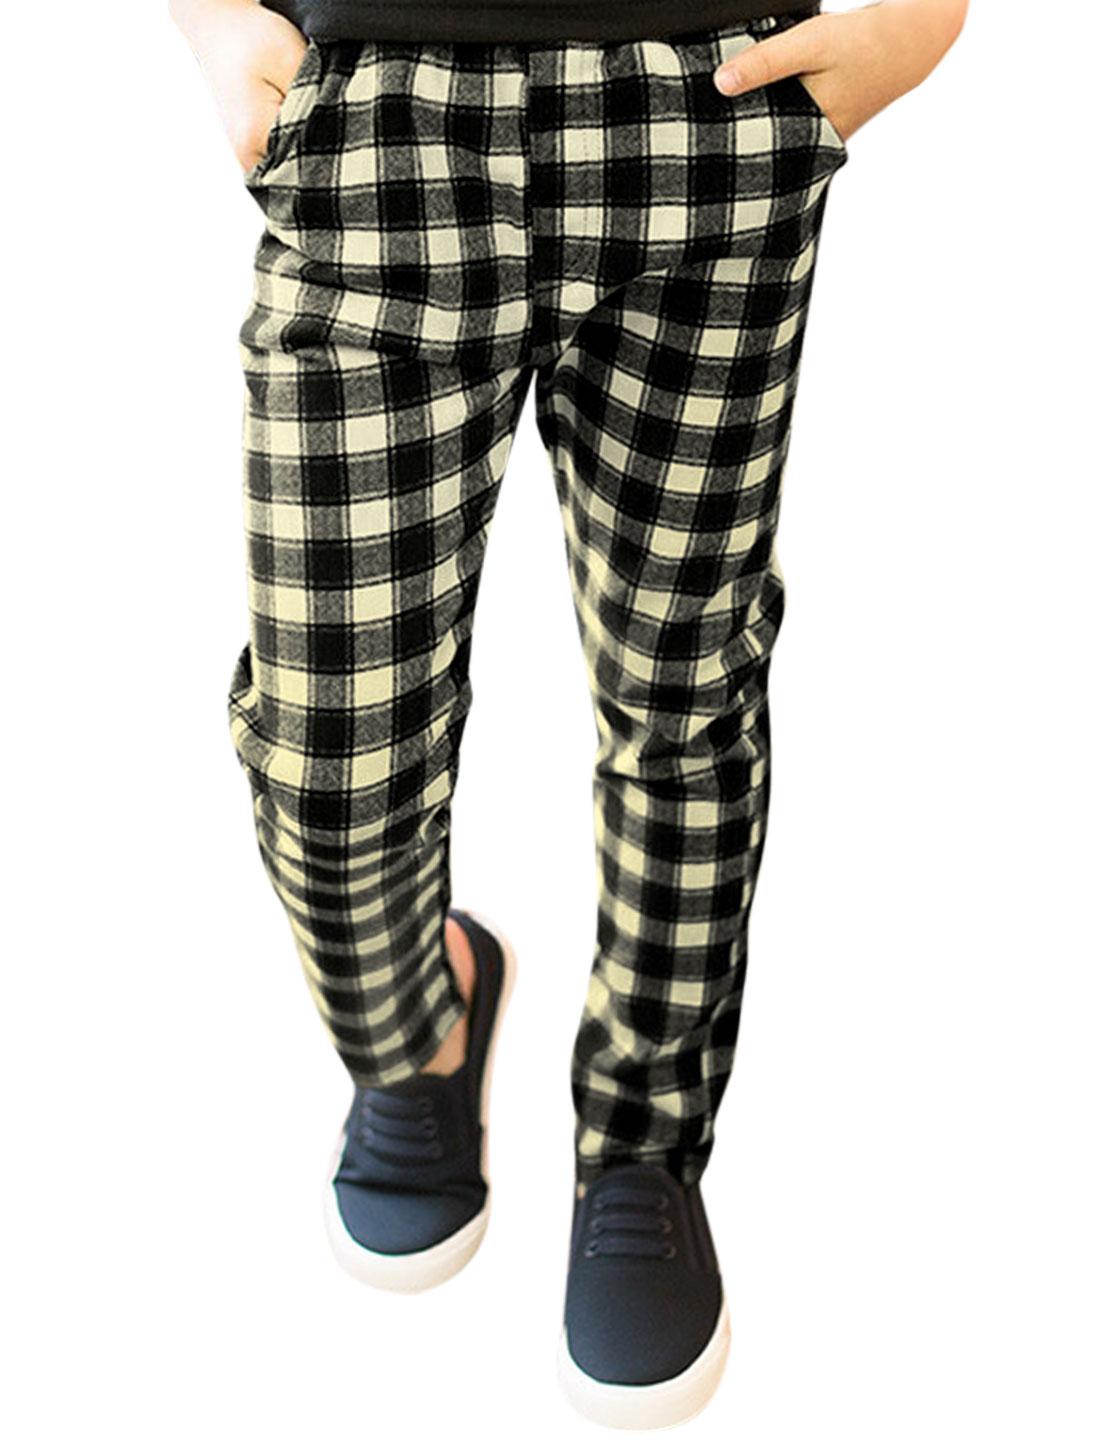 Boys Elastic Waist Slim Fit Plaids Trousers Black Beige 10